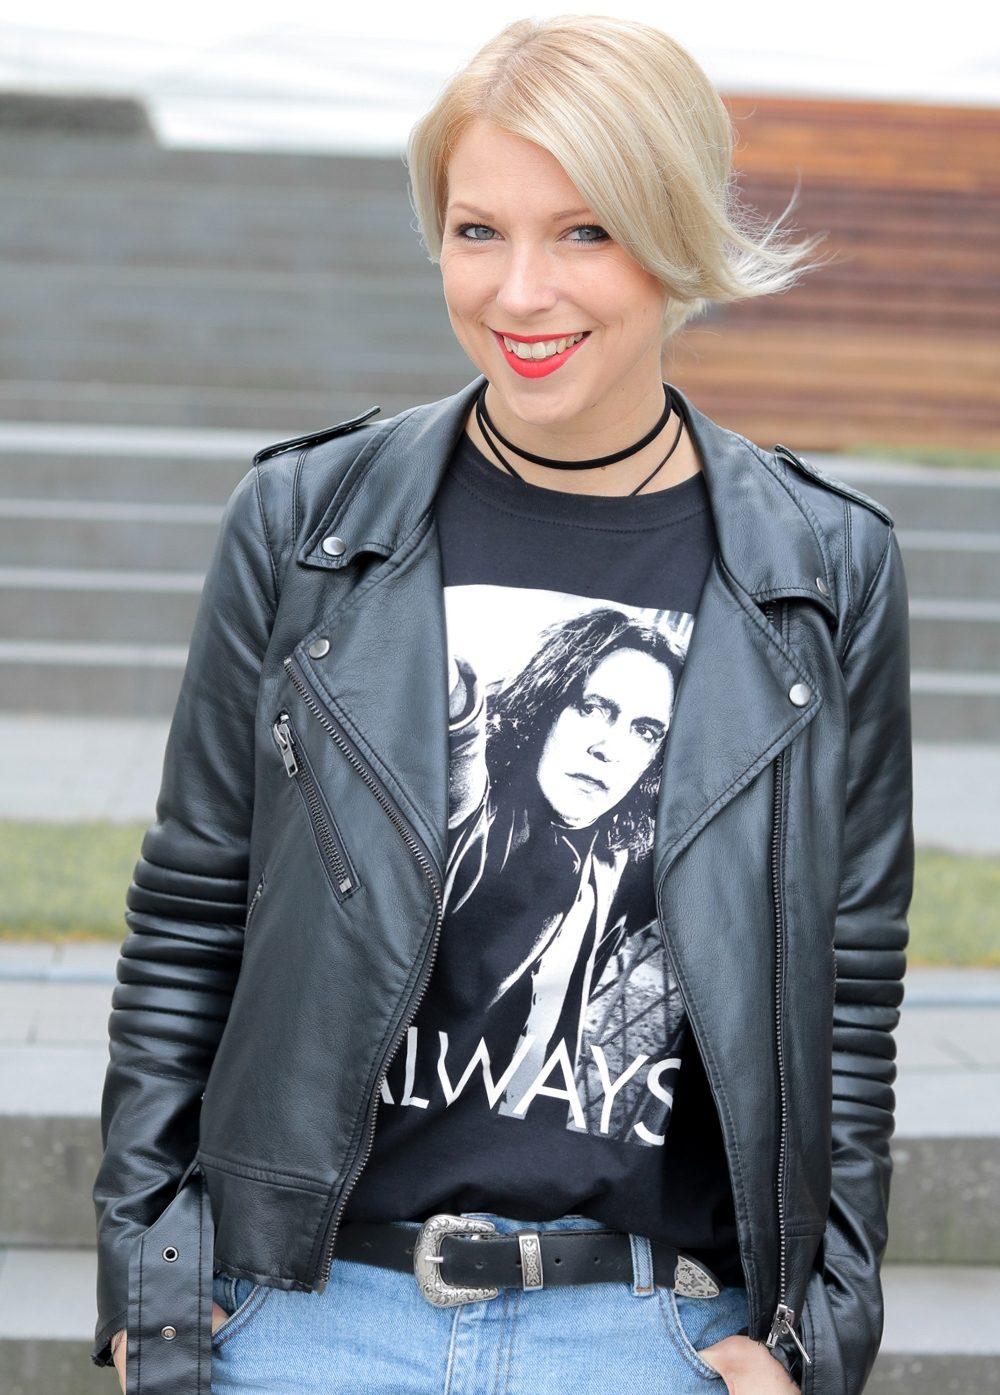 fashionblogger-heidelberg-outfit-shirt-snape-jeansshorts-chucks-lederjacke-8-von-15